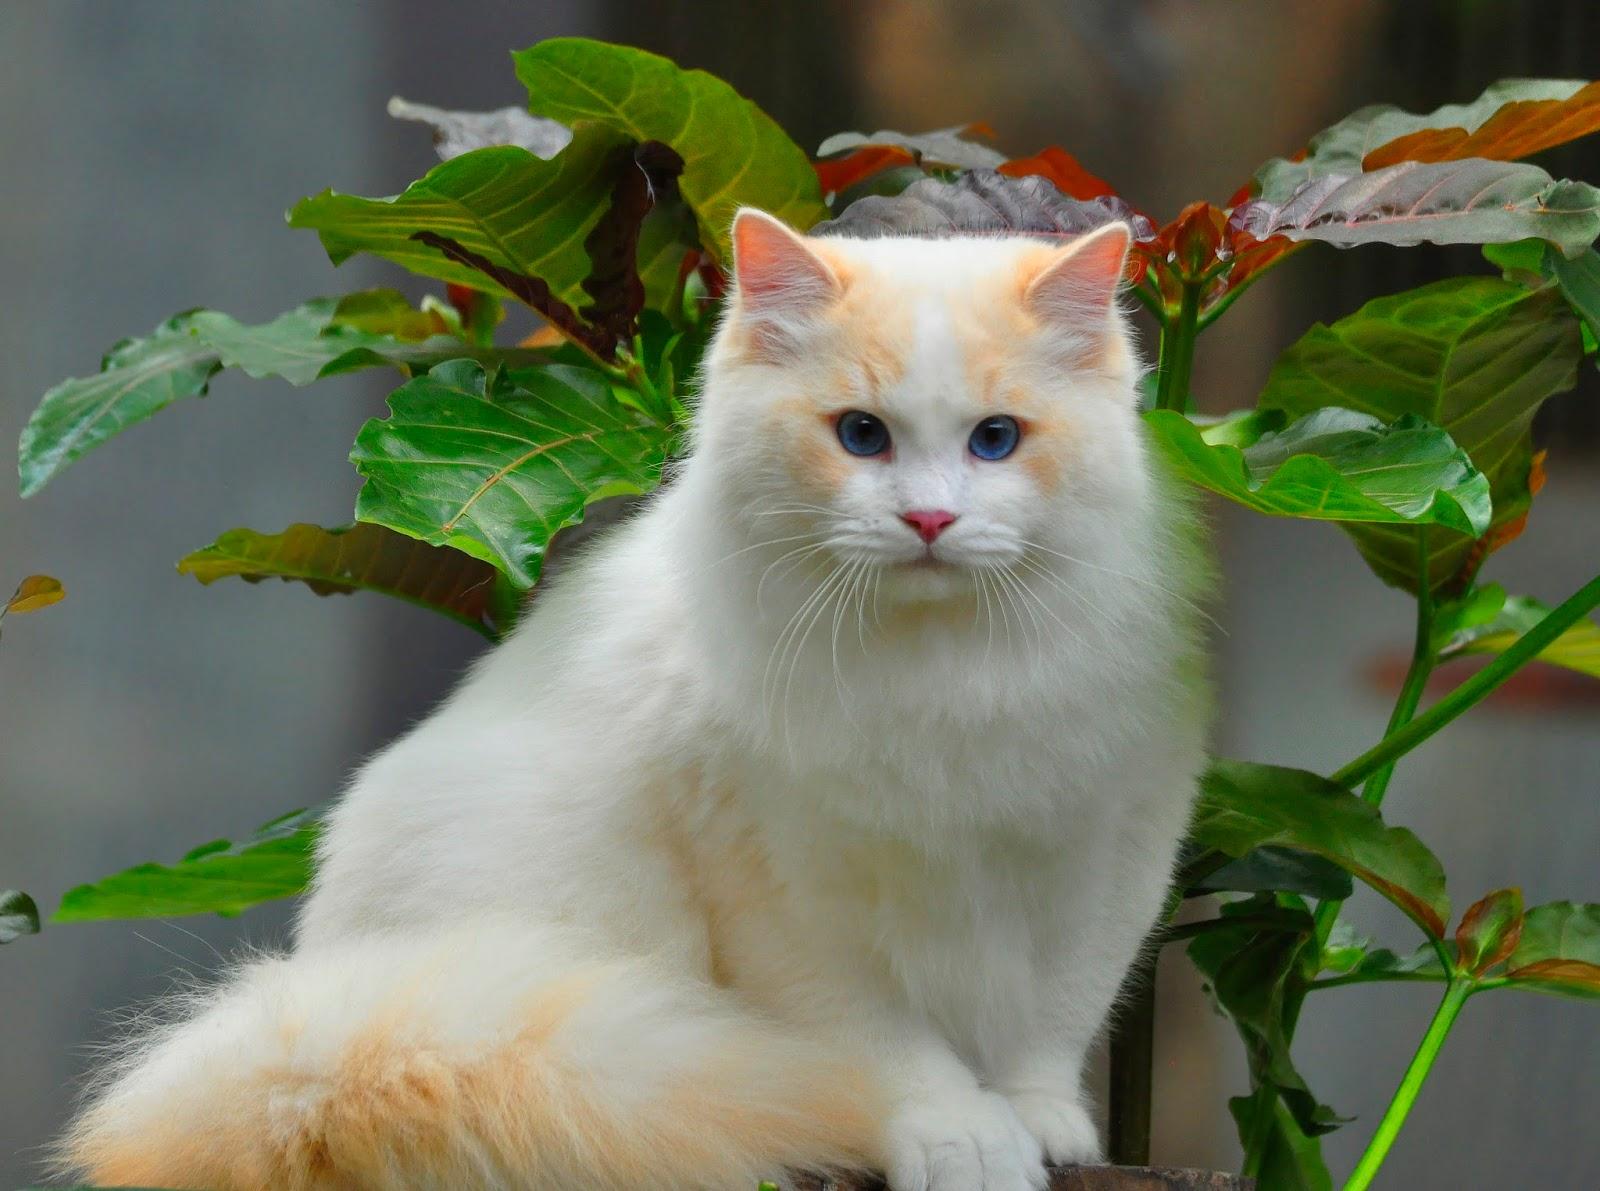 Gambar Kucing Wajah Manusia godean.web.id